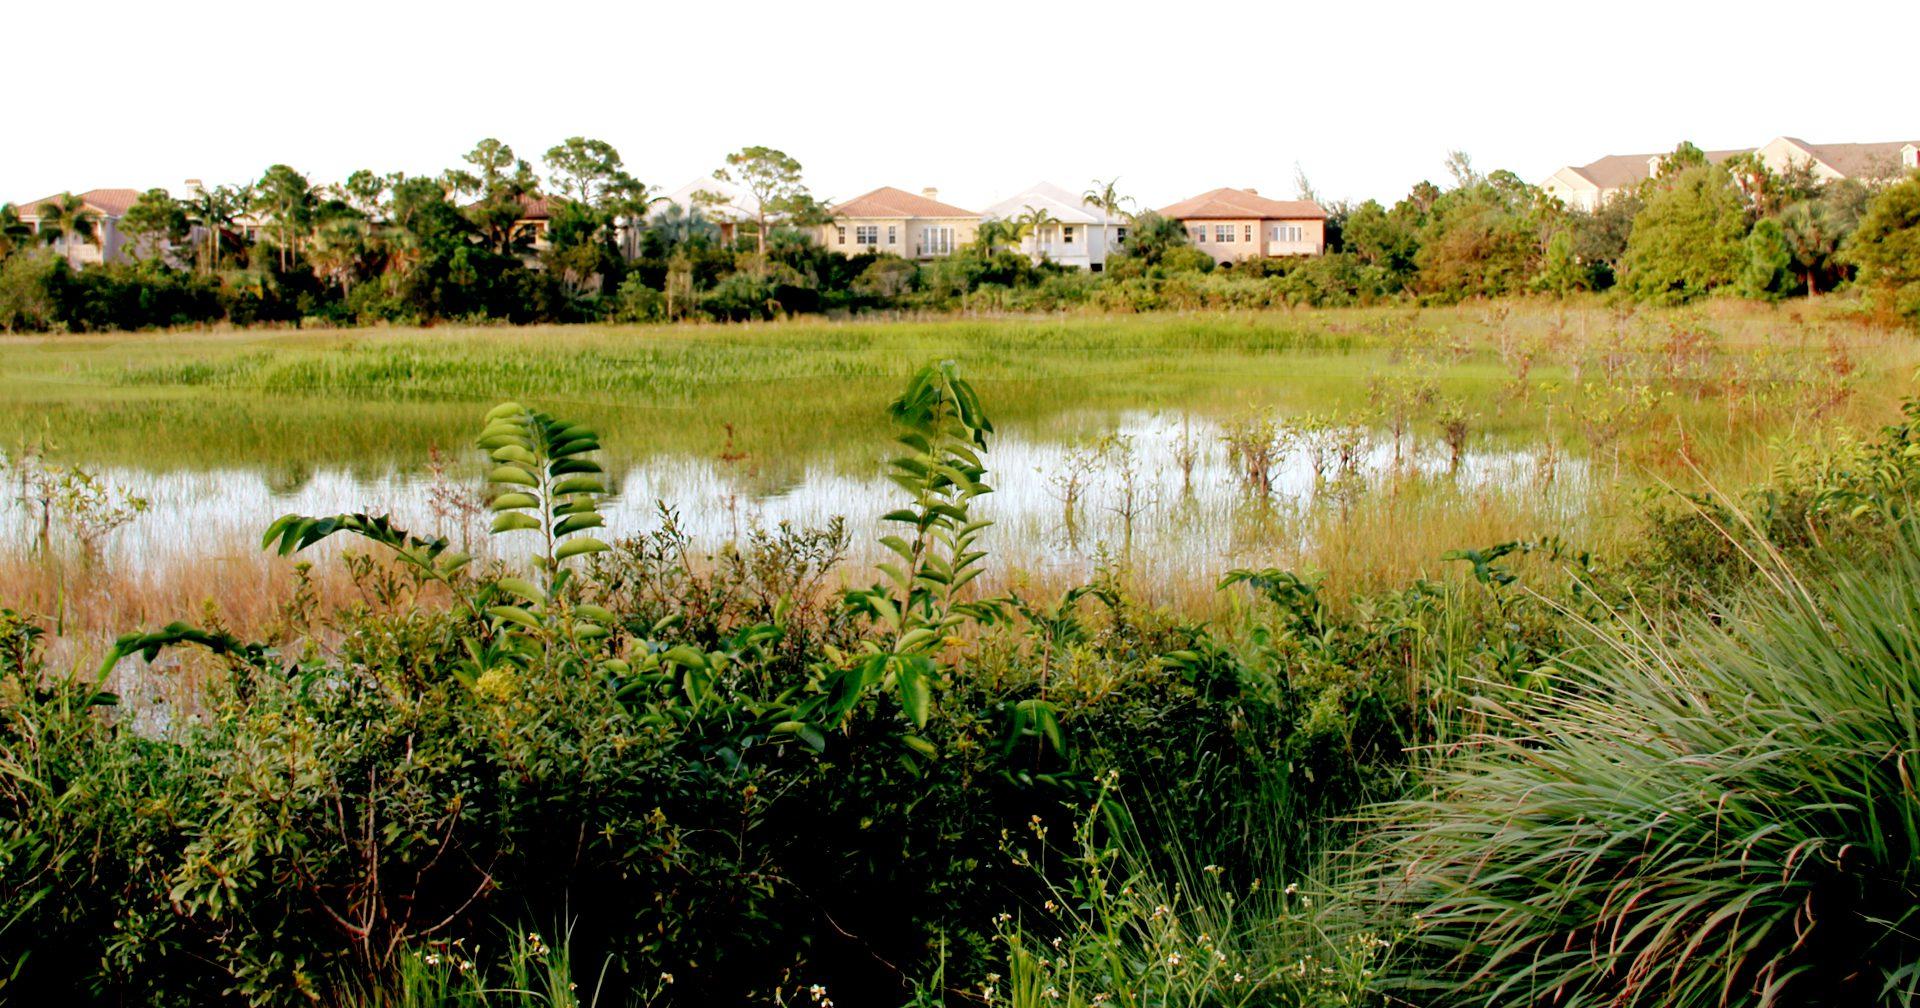 Botanica Wetland